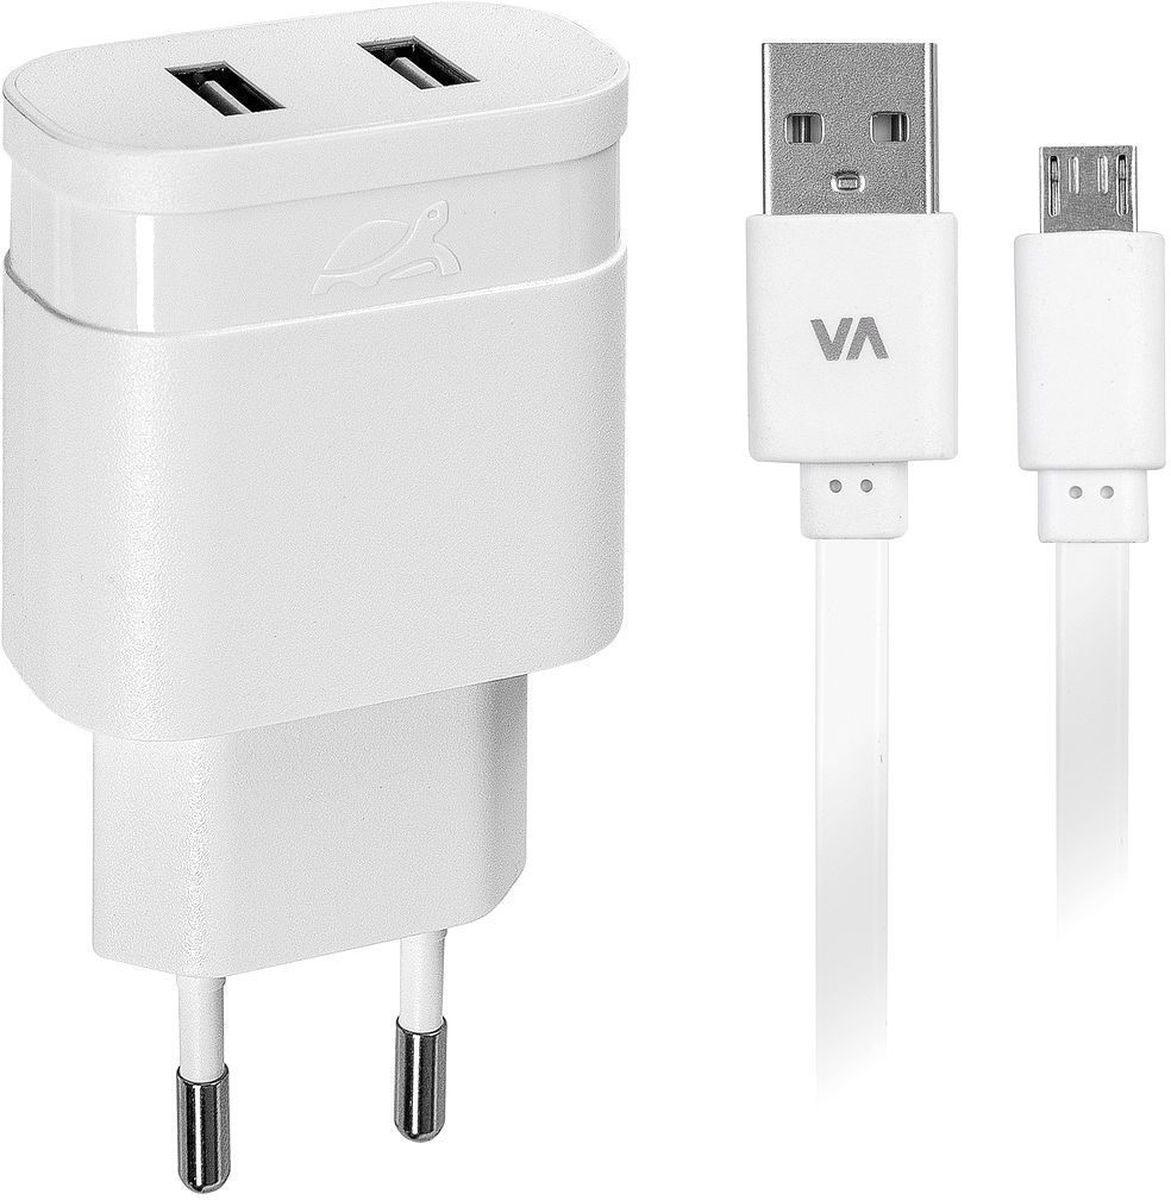 Rivapower VA4122 WD1, White сетевое зарядное устройство rivapower va4122 w00 white сетевое зарядное устройство